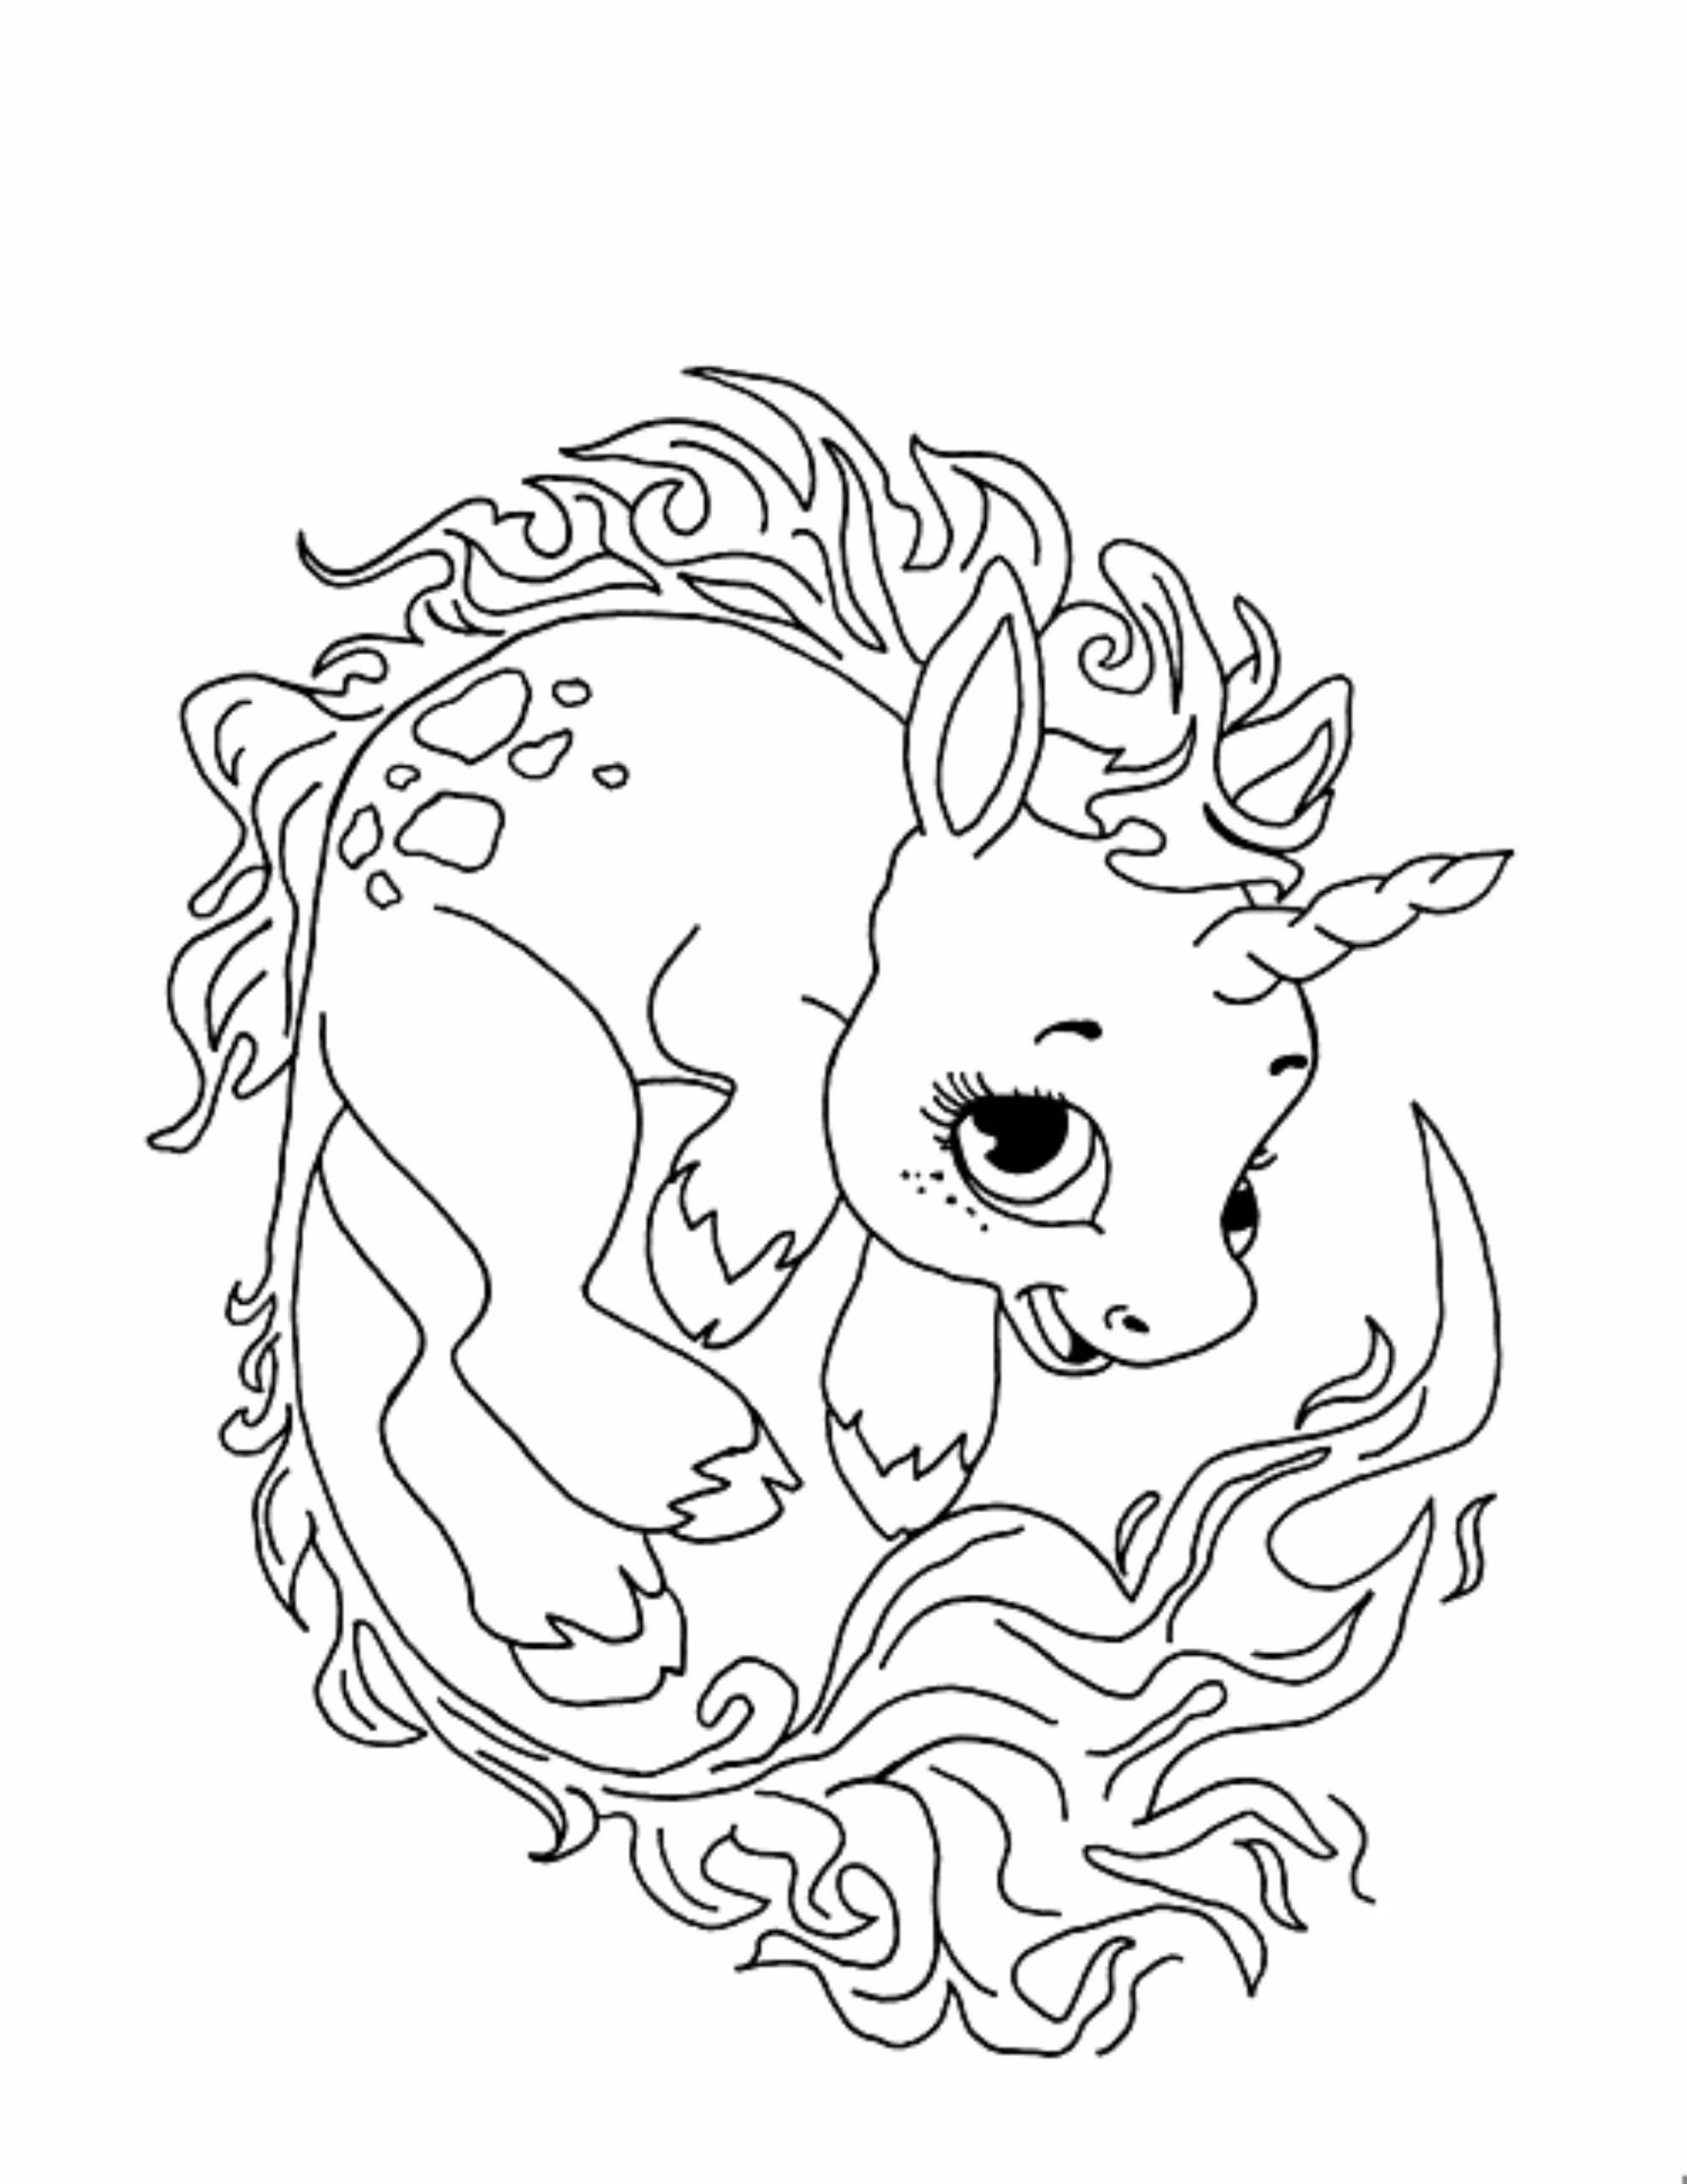 coloring page unicorn print download unicorn coloring pages for children page coloring unicorn